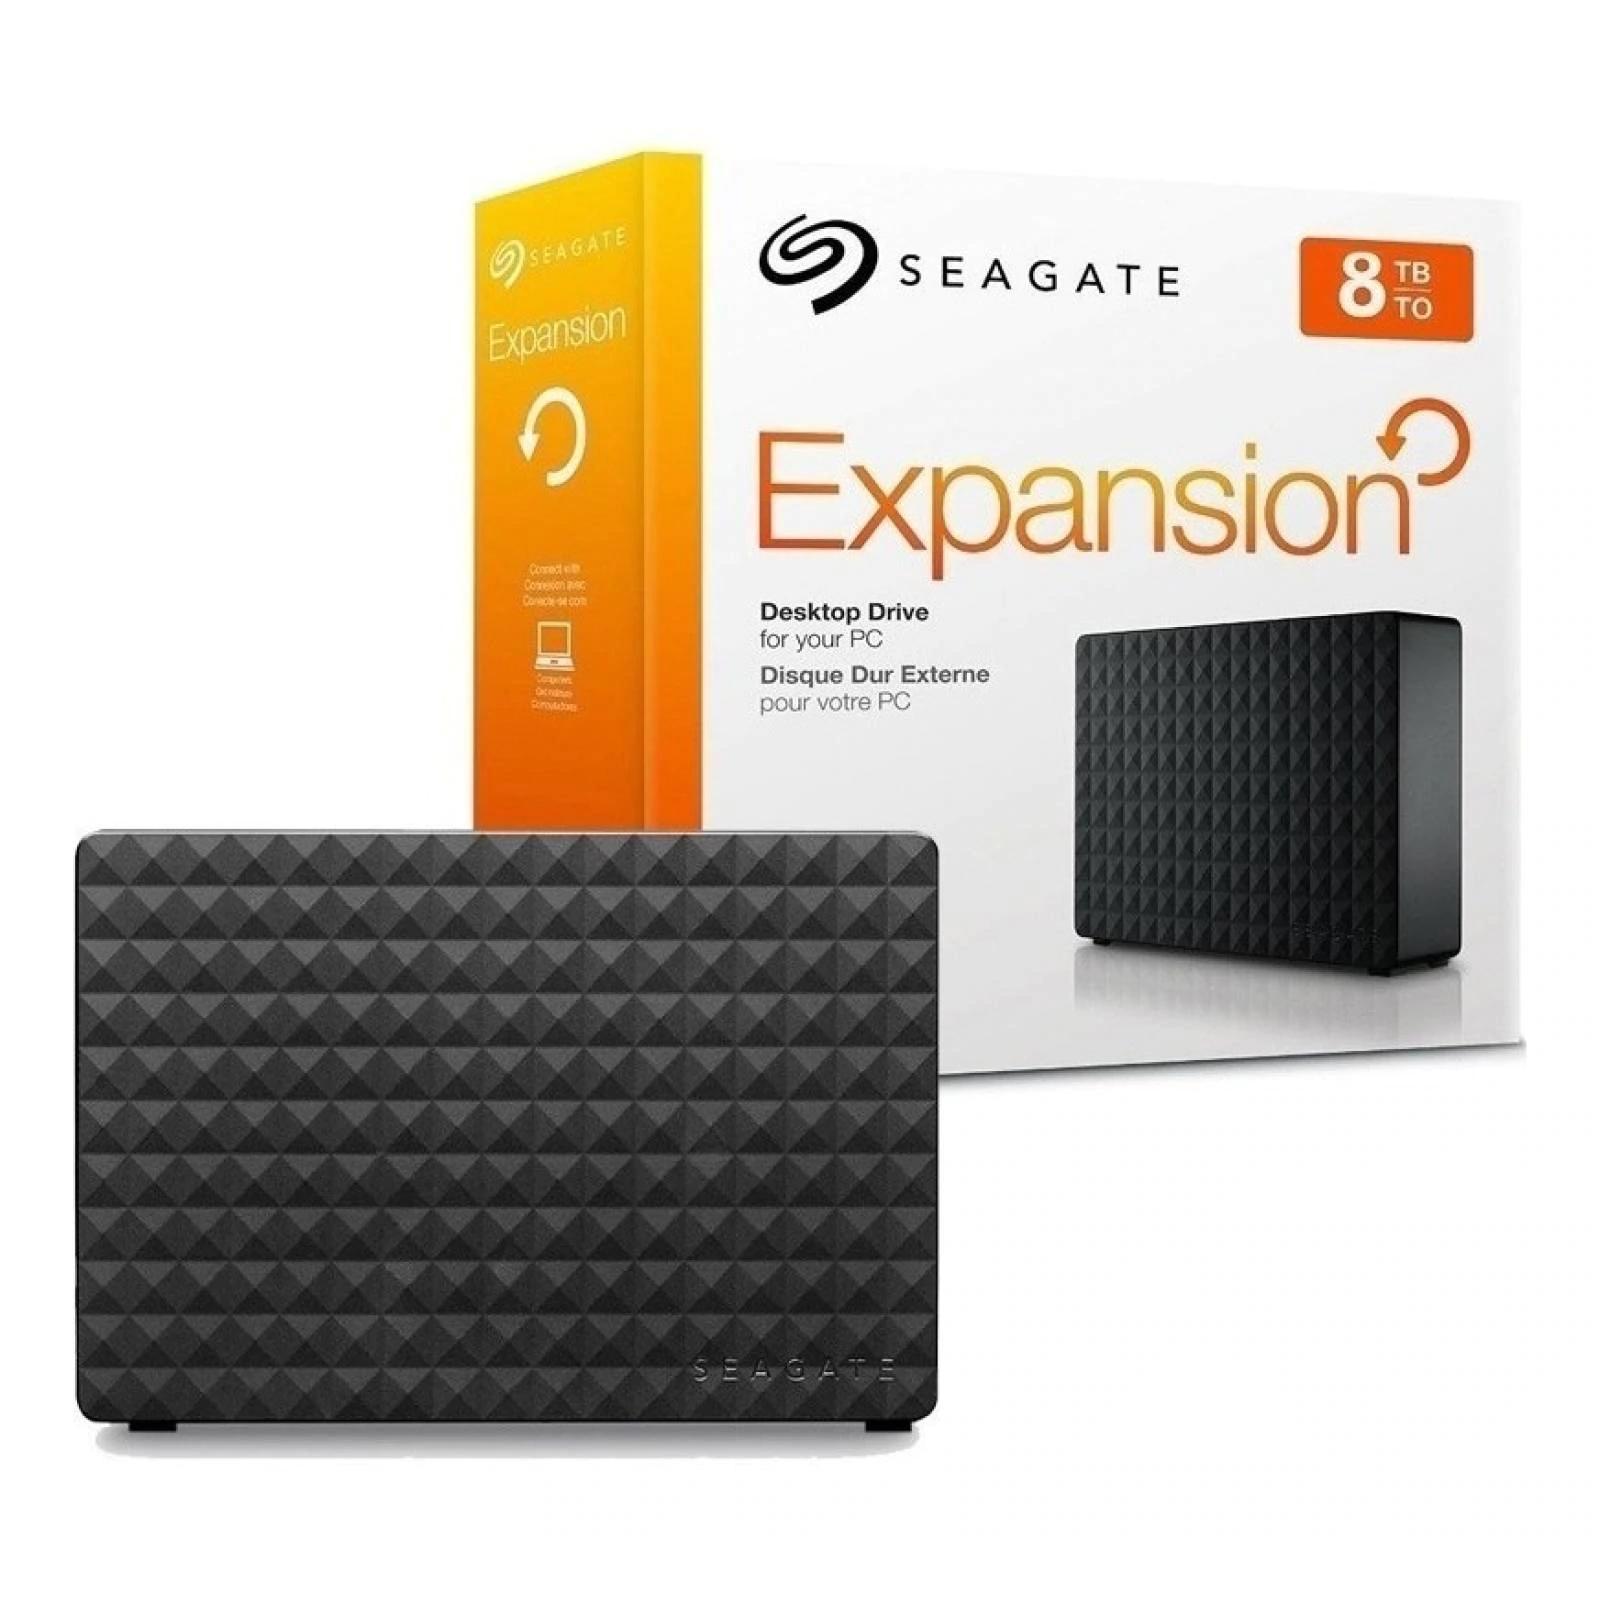 Disco duro Seagate Expansion externo 8 TB USB 3.0